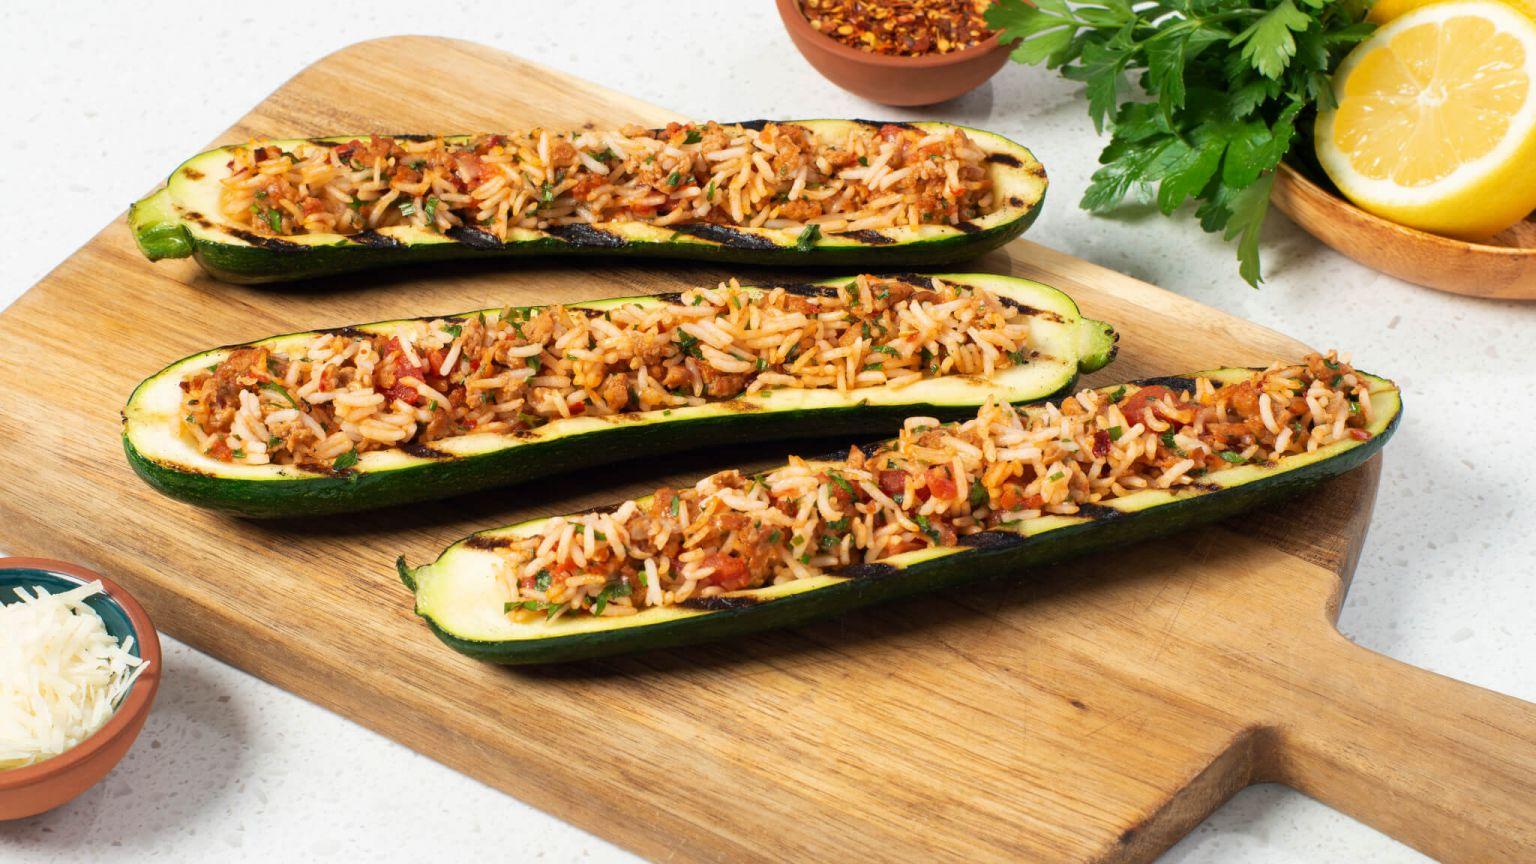 Zucchini Boats Stuffed with Rice and Sausage